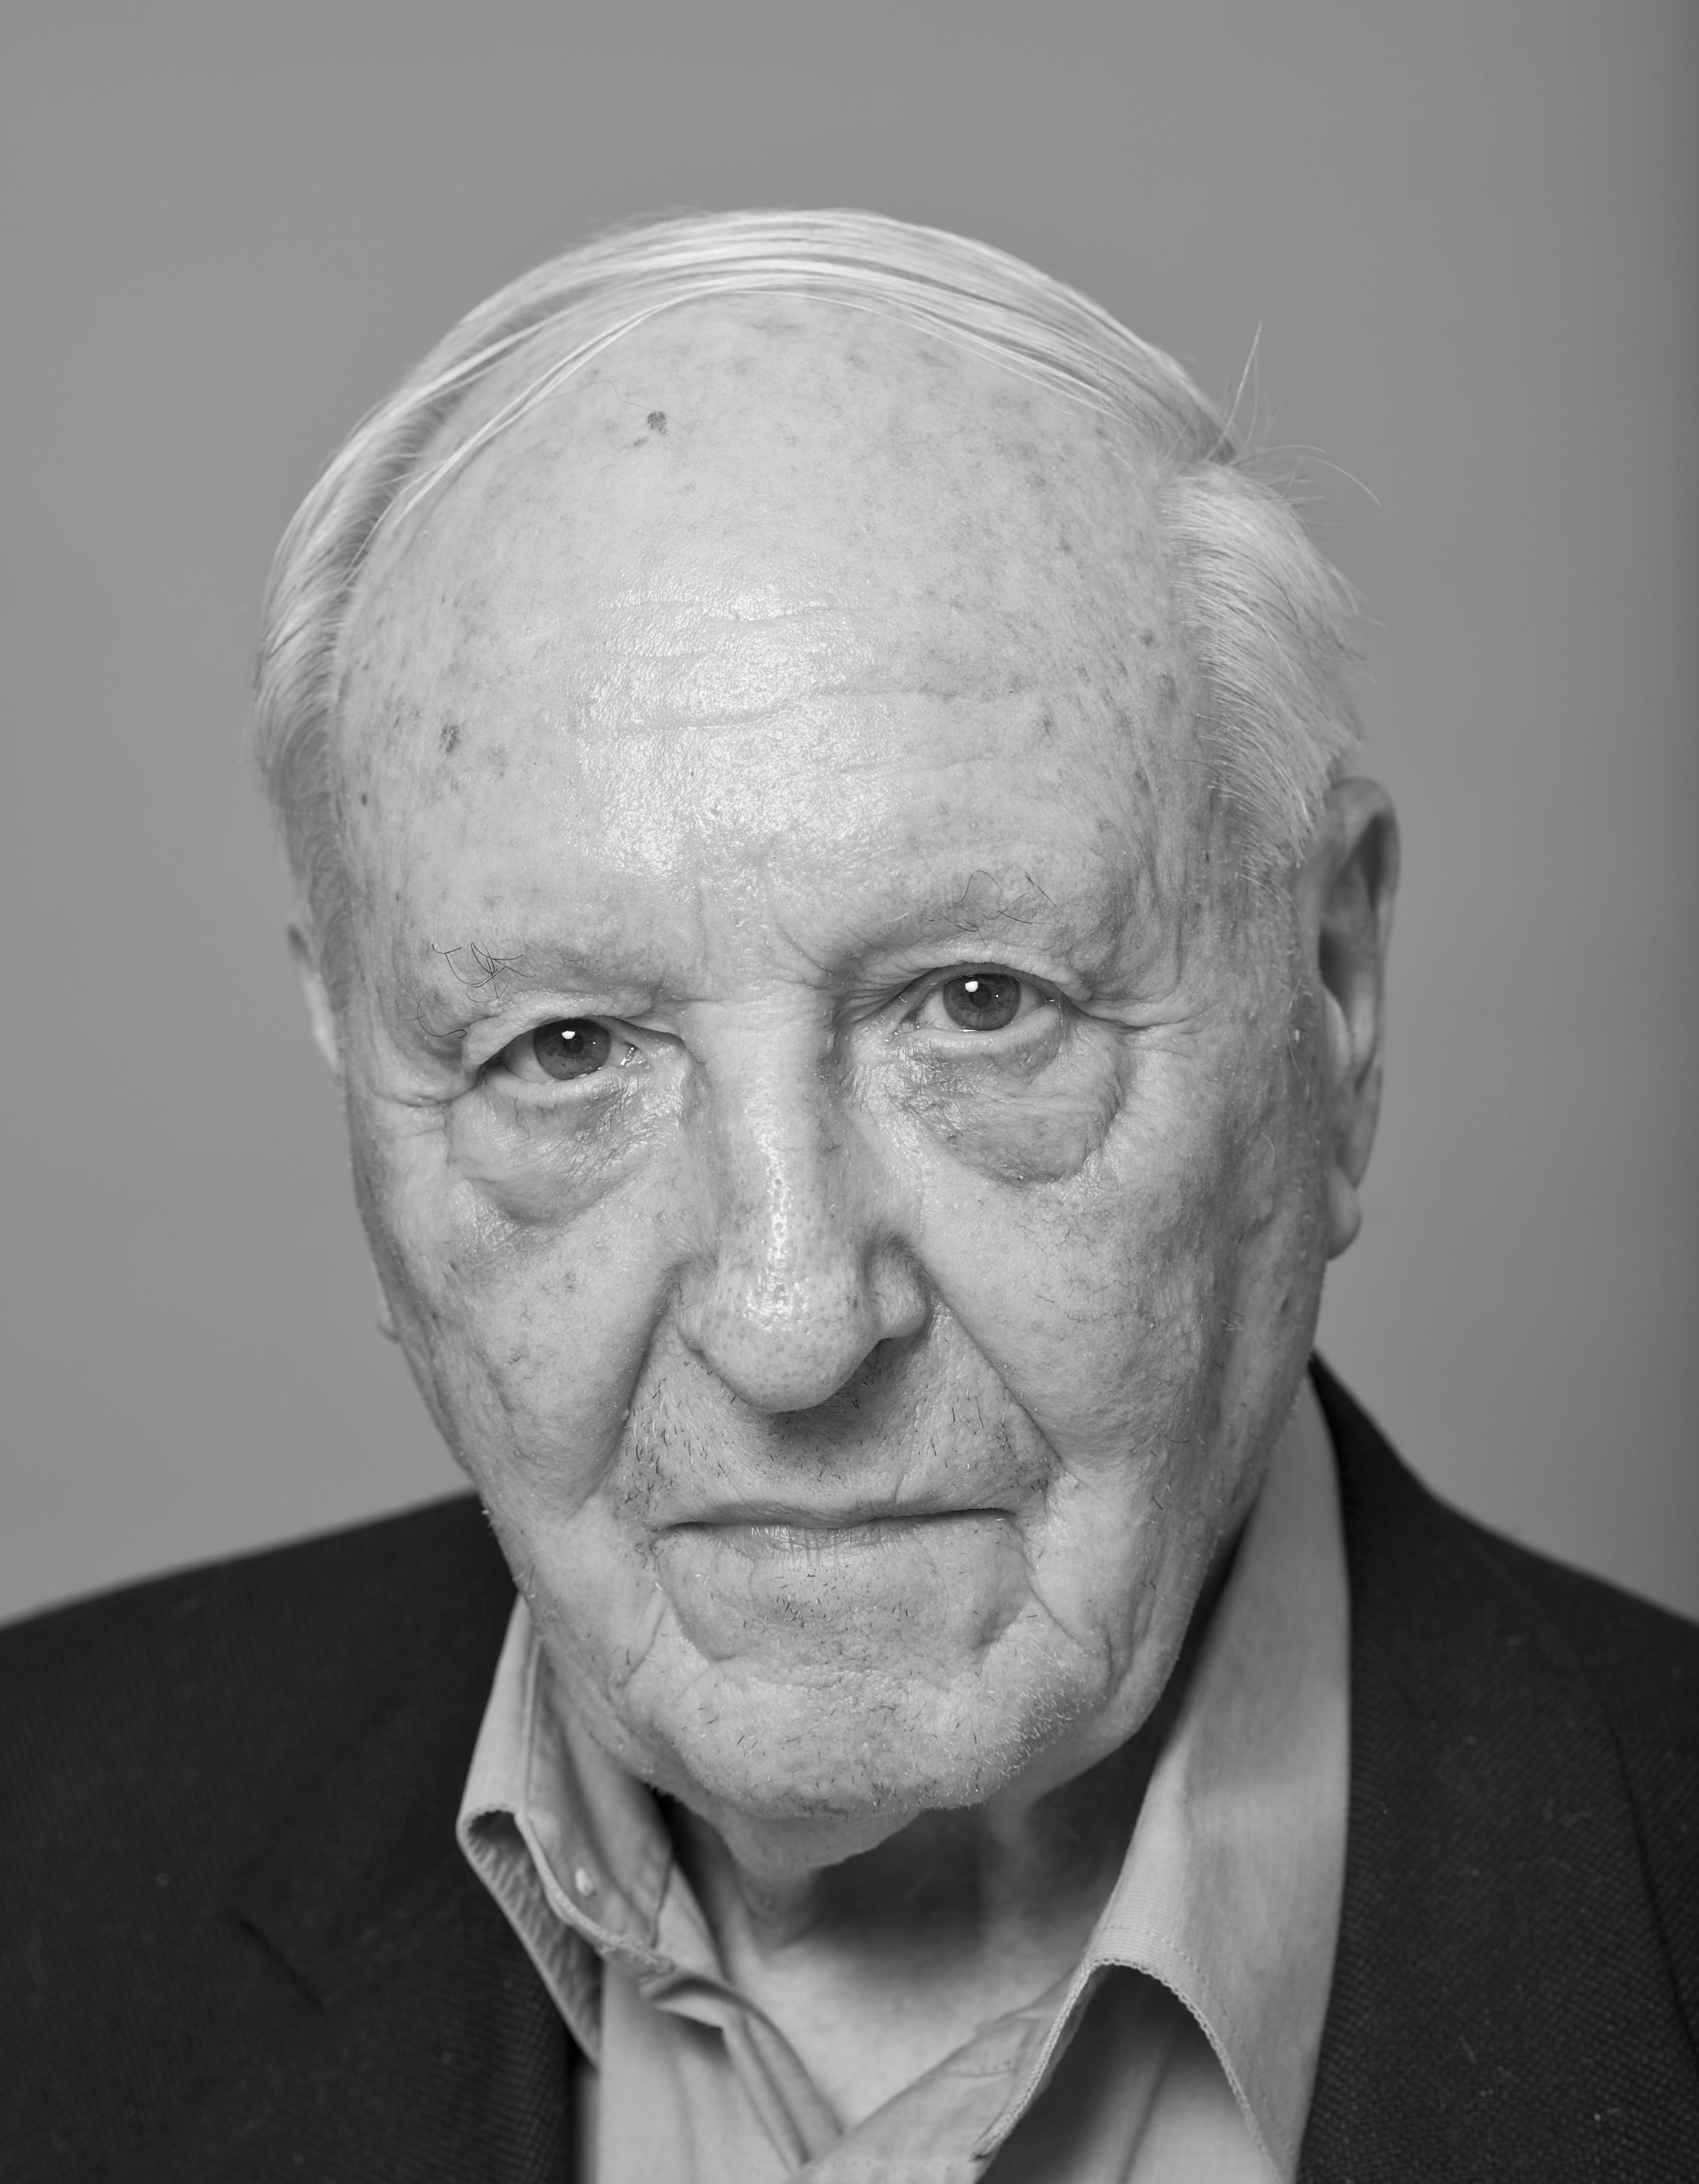 Fabromont-Gründer Günter Tesch gestorben